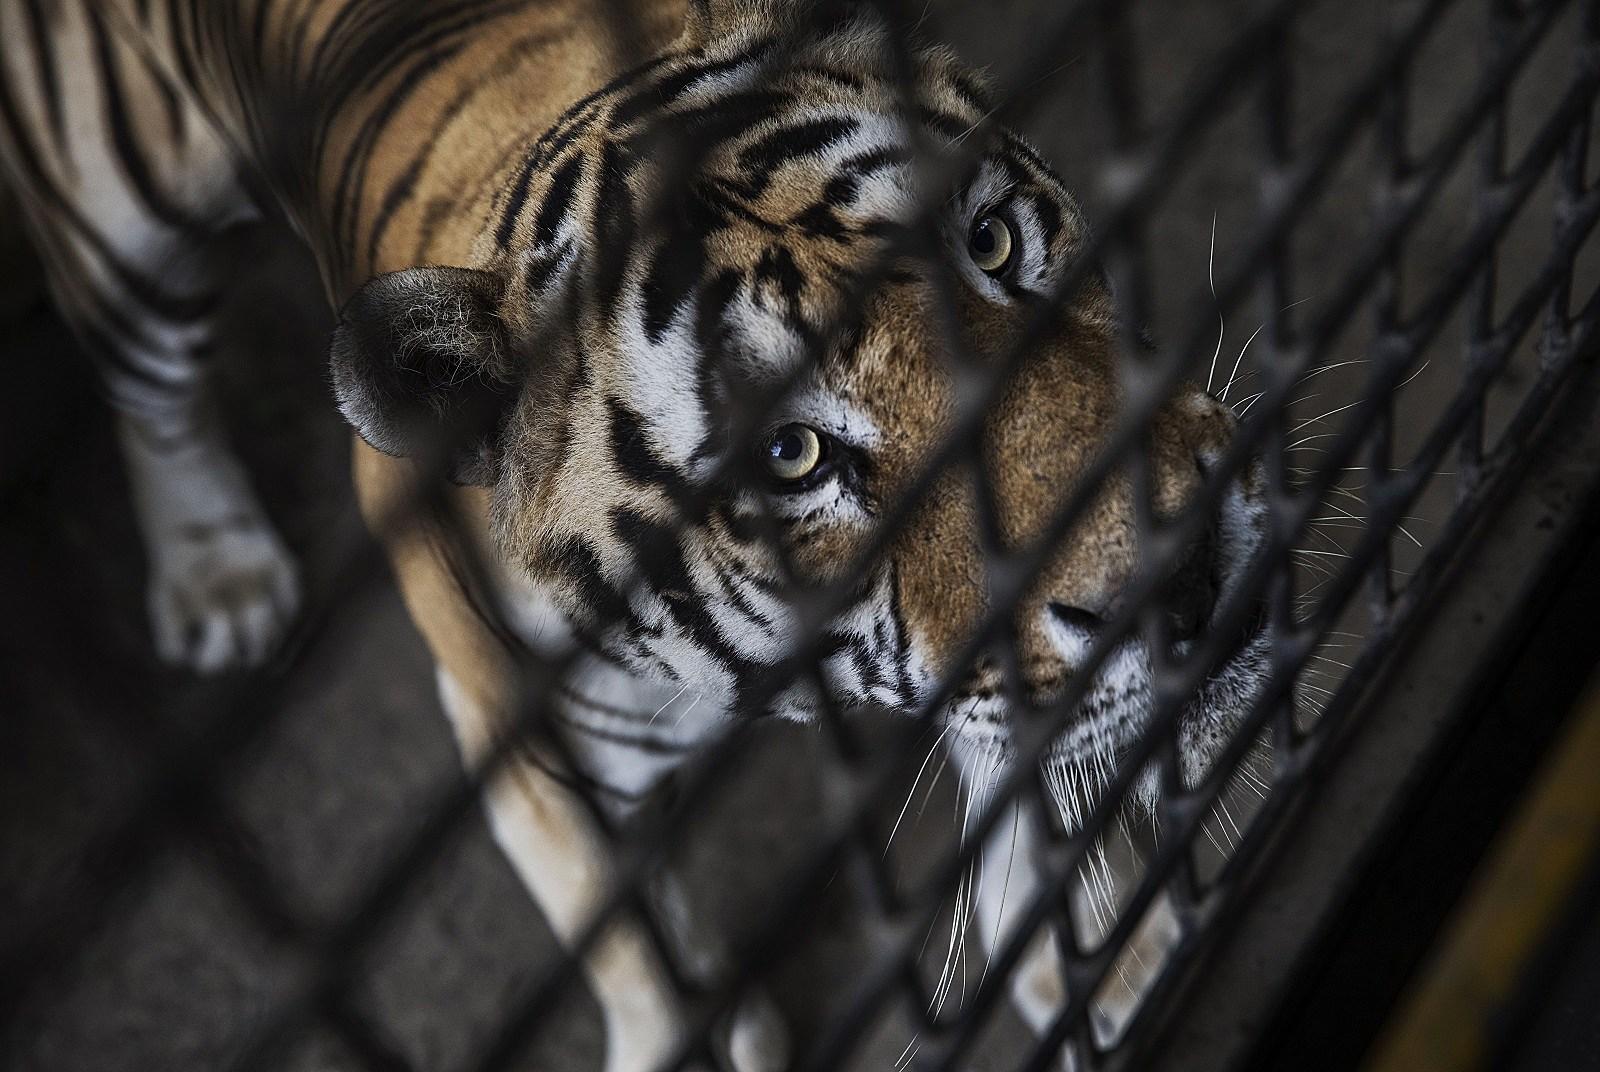 iowa zoo has license revoked